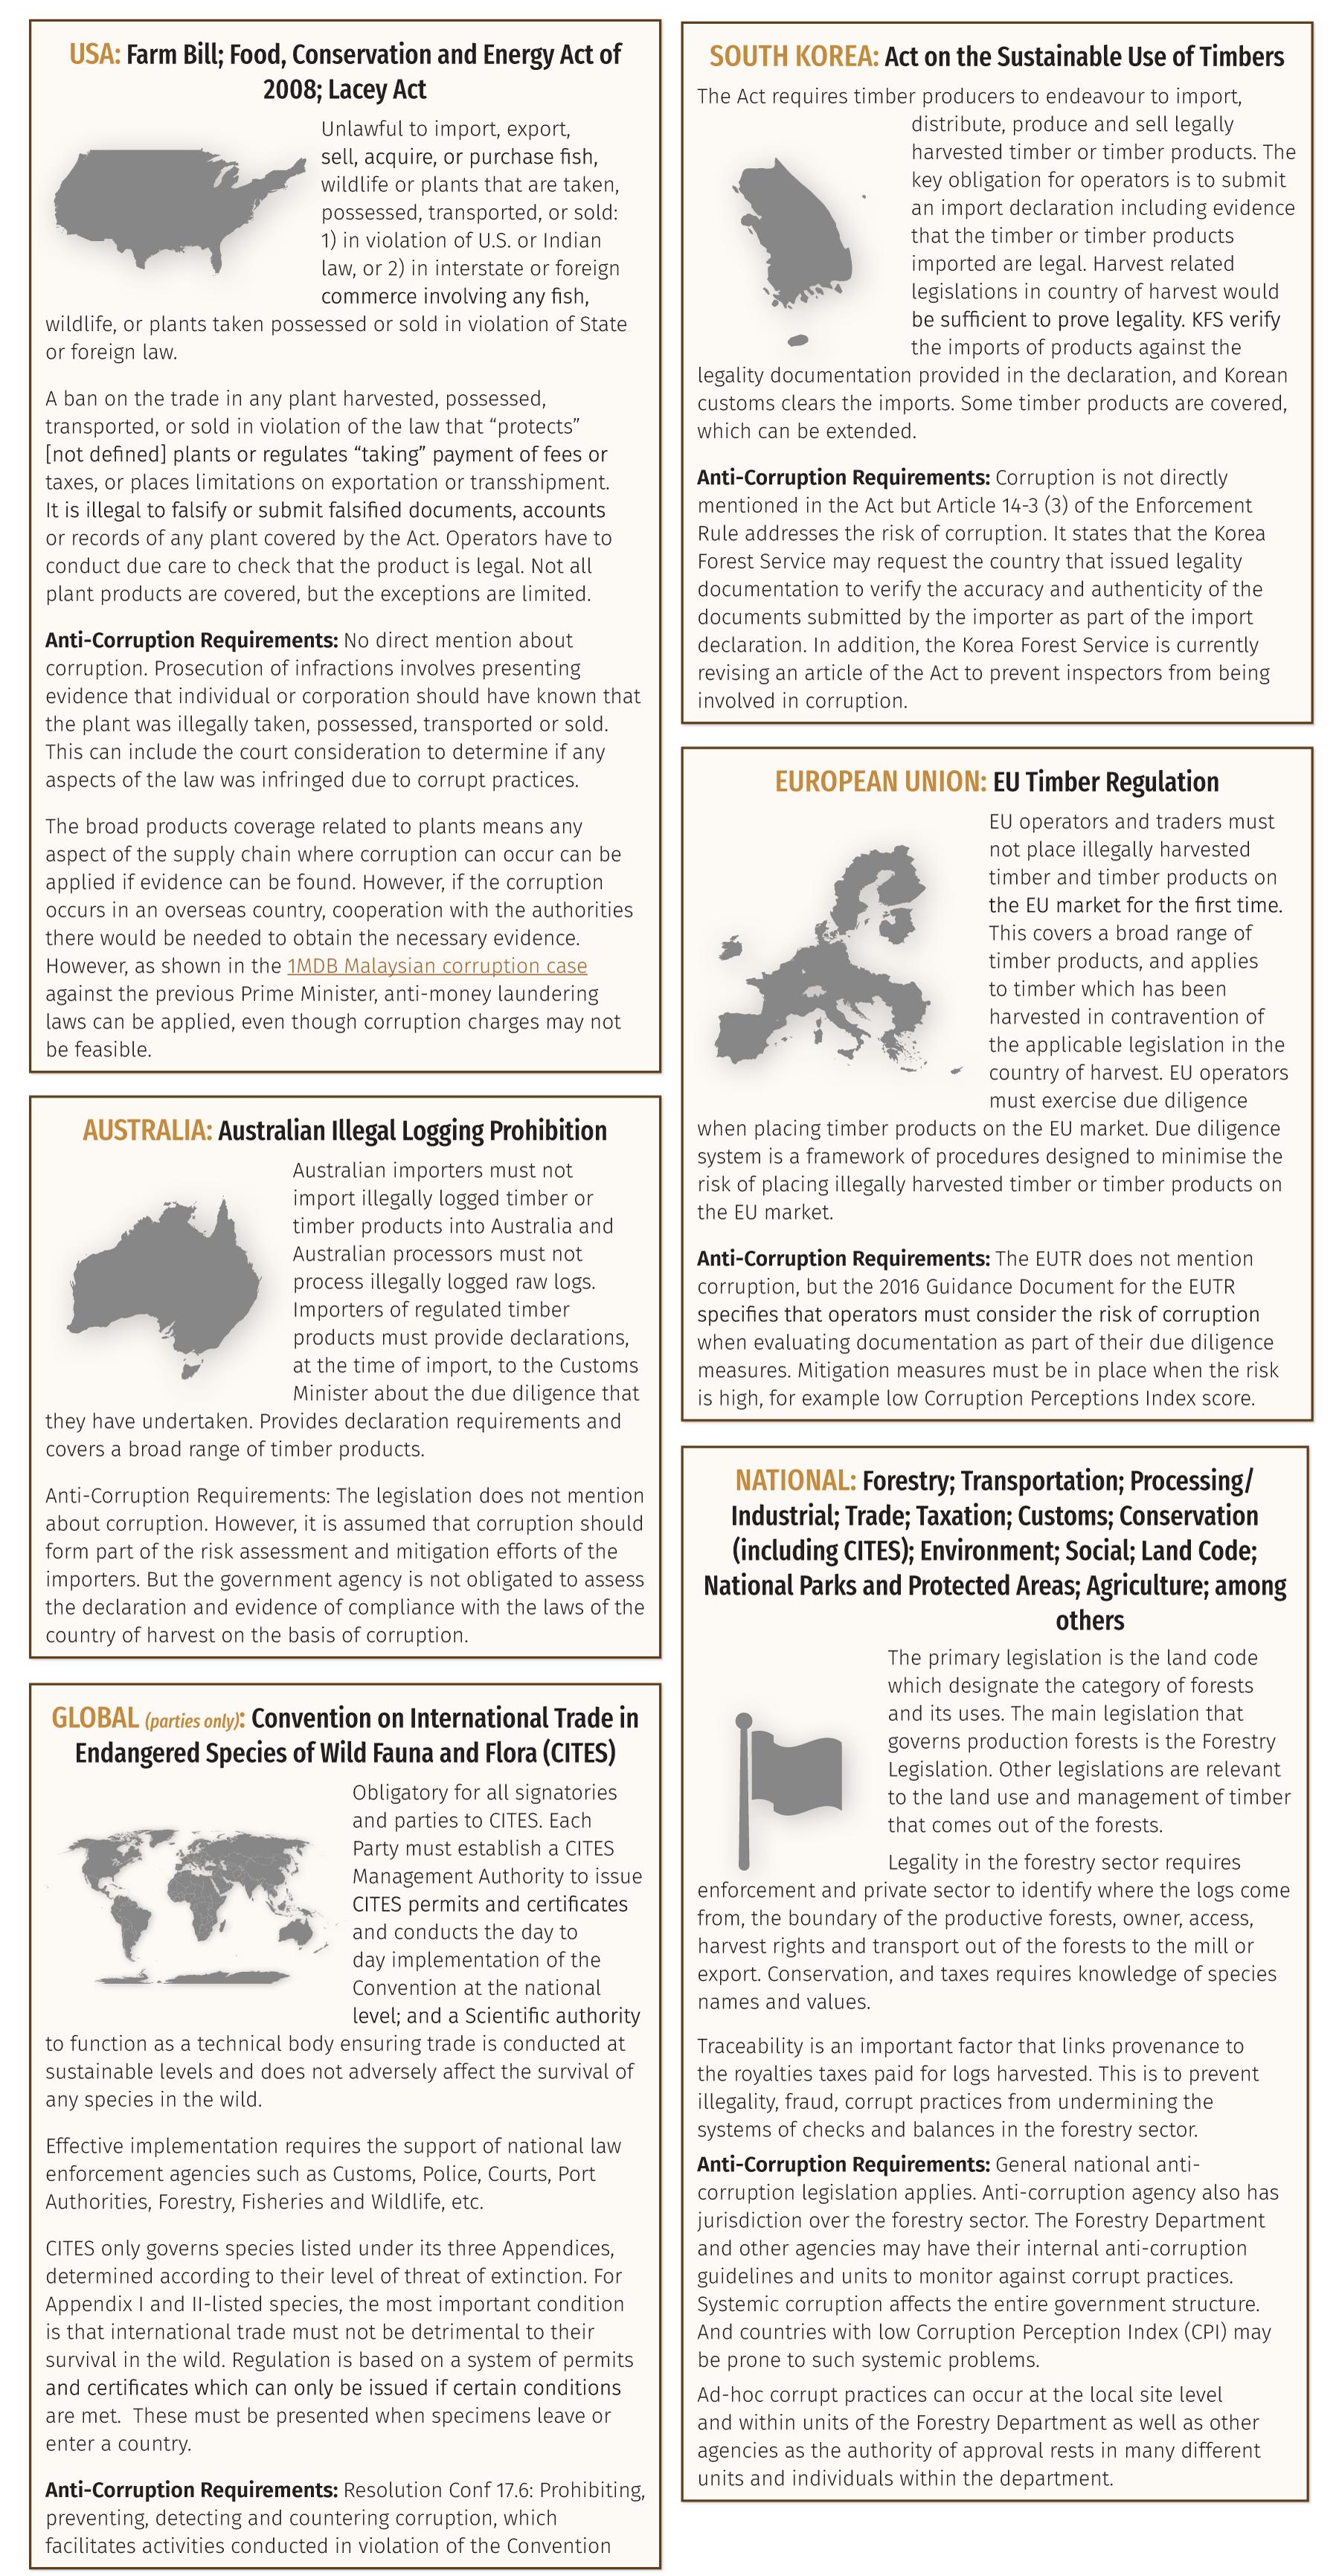 Figure 1: International measures against illegal logging